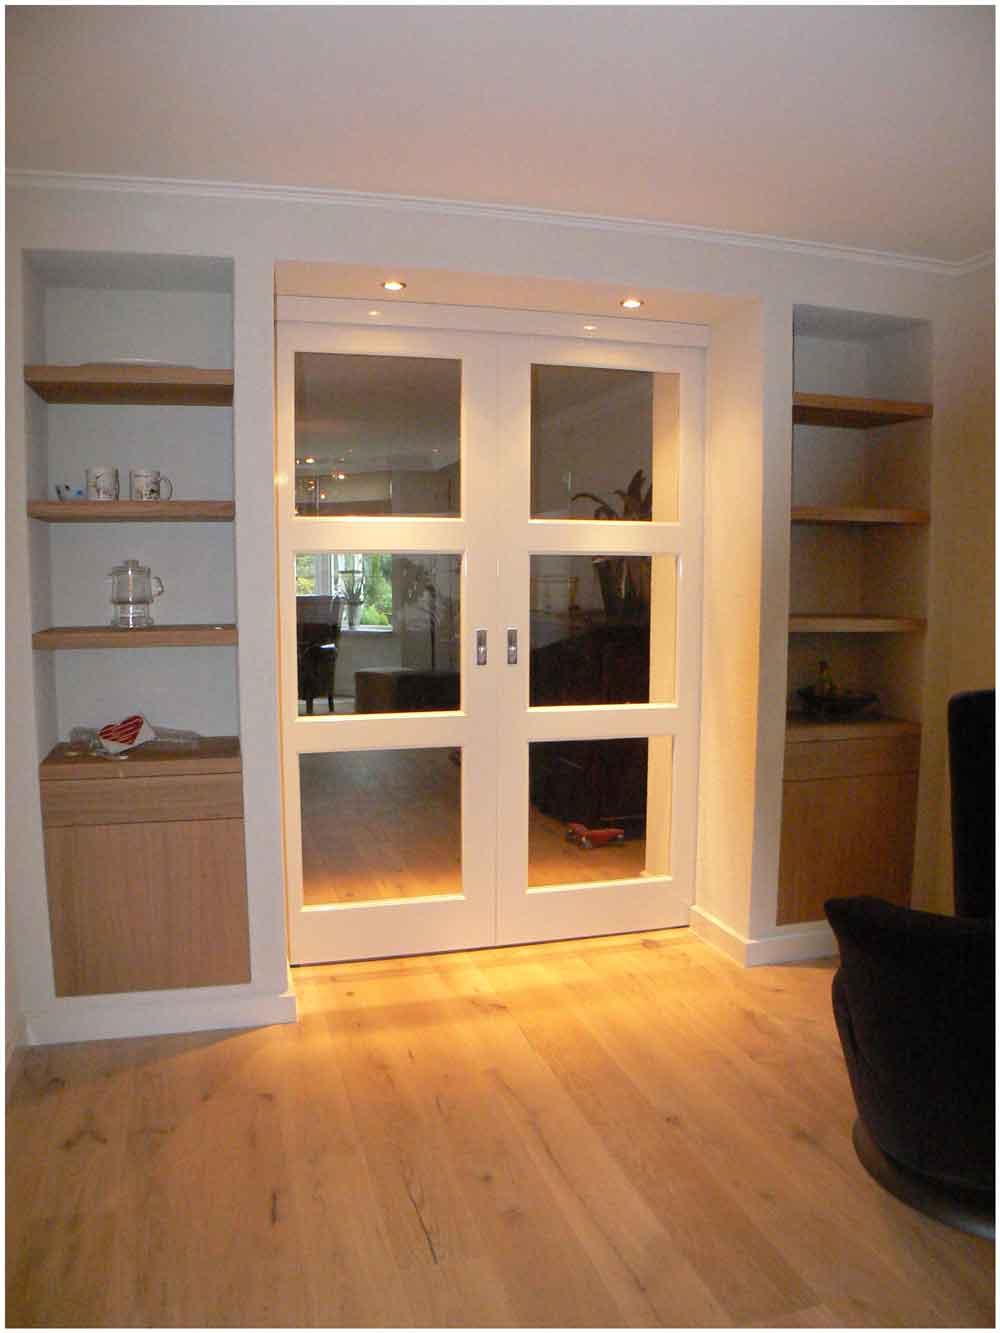 Kast Kamer En Suite: Interieur complete inrichting elon vloer. Beide ...